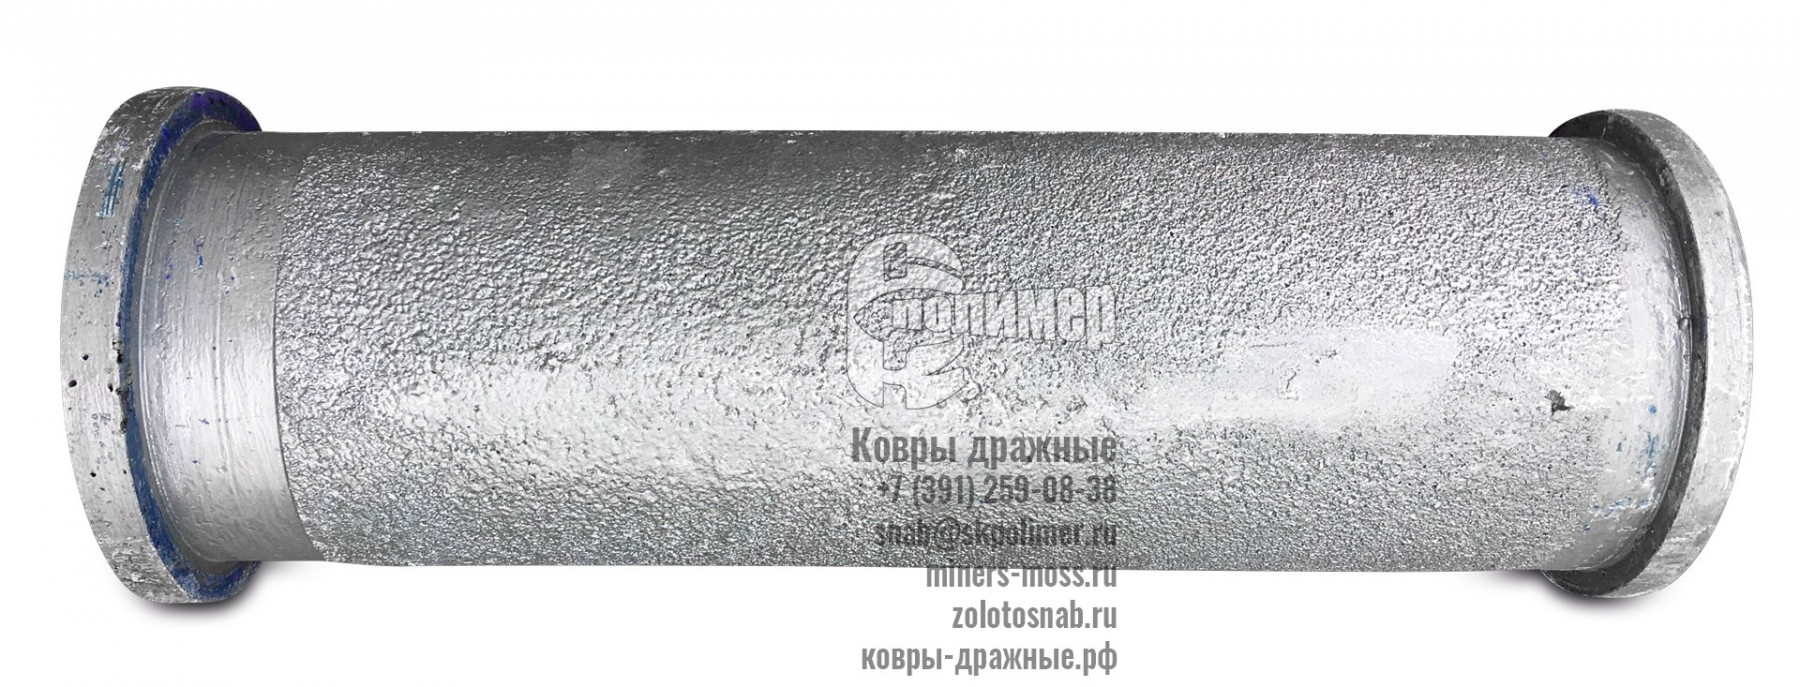 2 стакан гидроэлеватора ГЭ 190/400